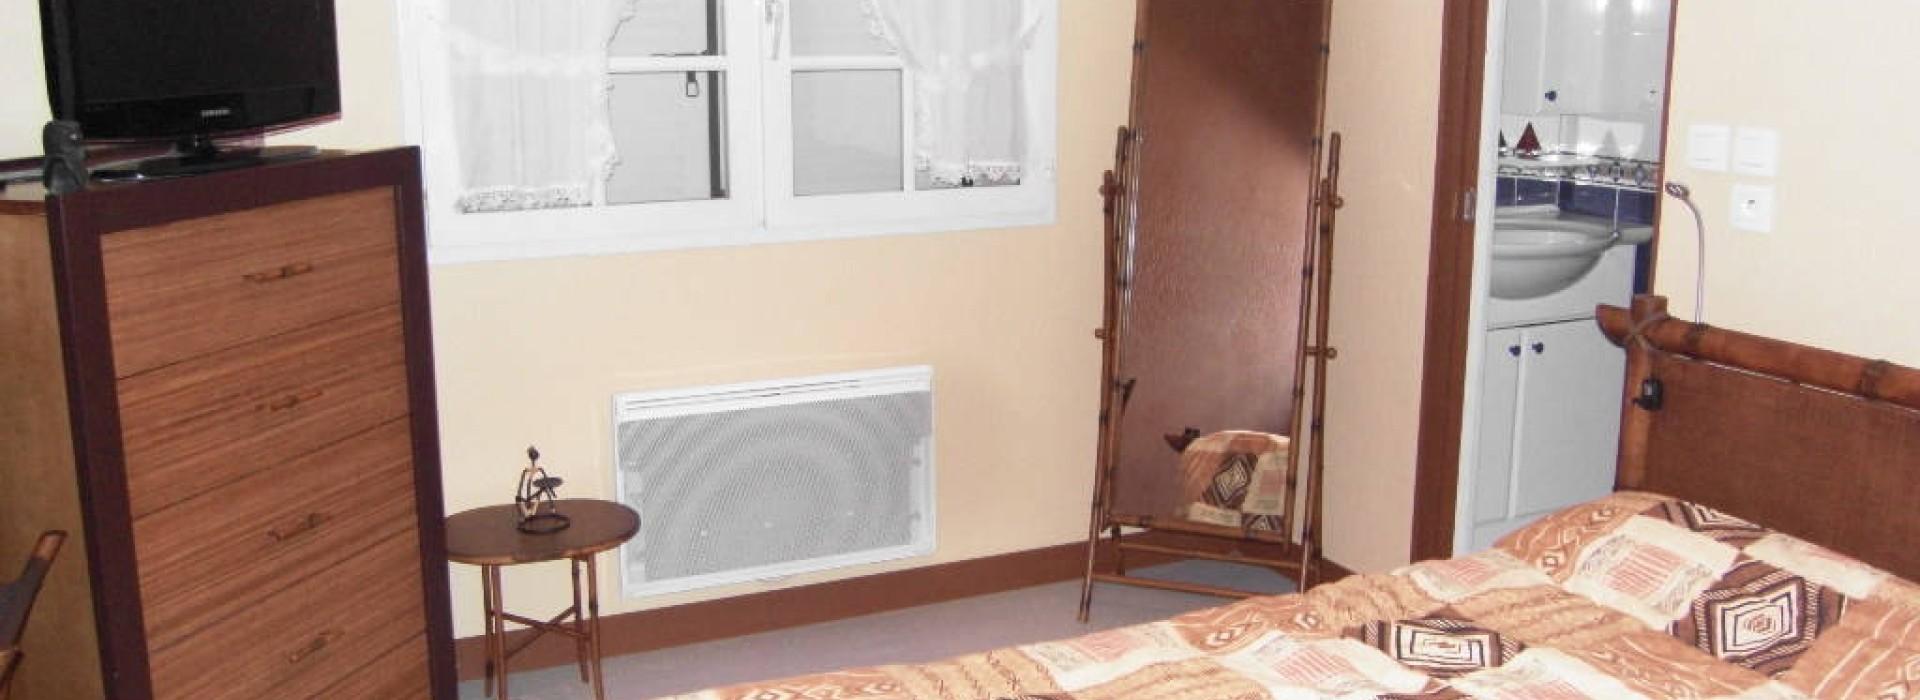 chambre d 39 hotes voyer daniel bed and breakfast frankrijk pays de la loire. Black Bedroom Furniture Sets. Home Design Ideas